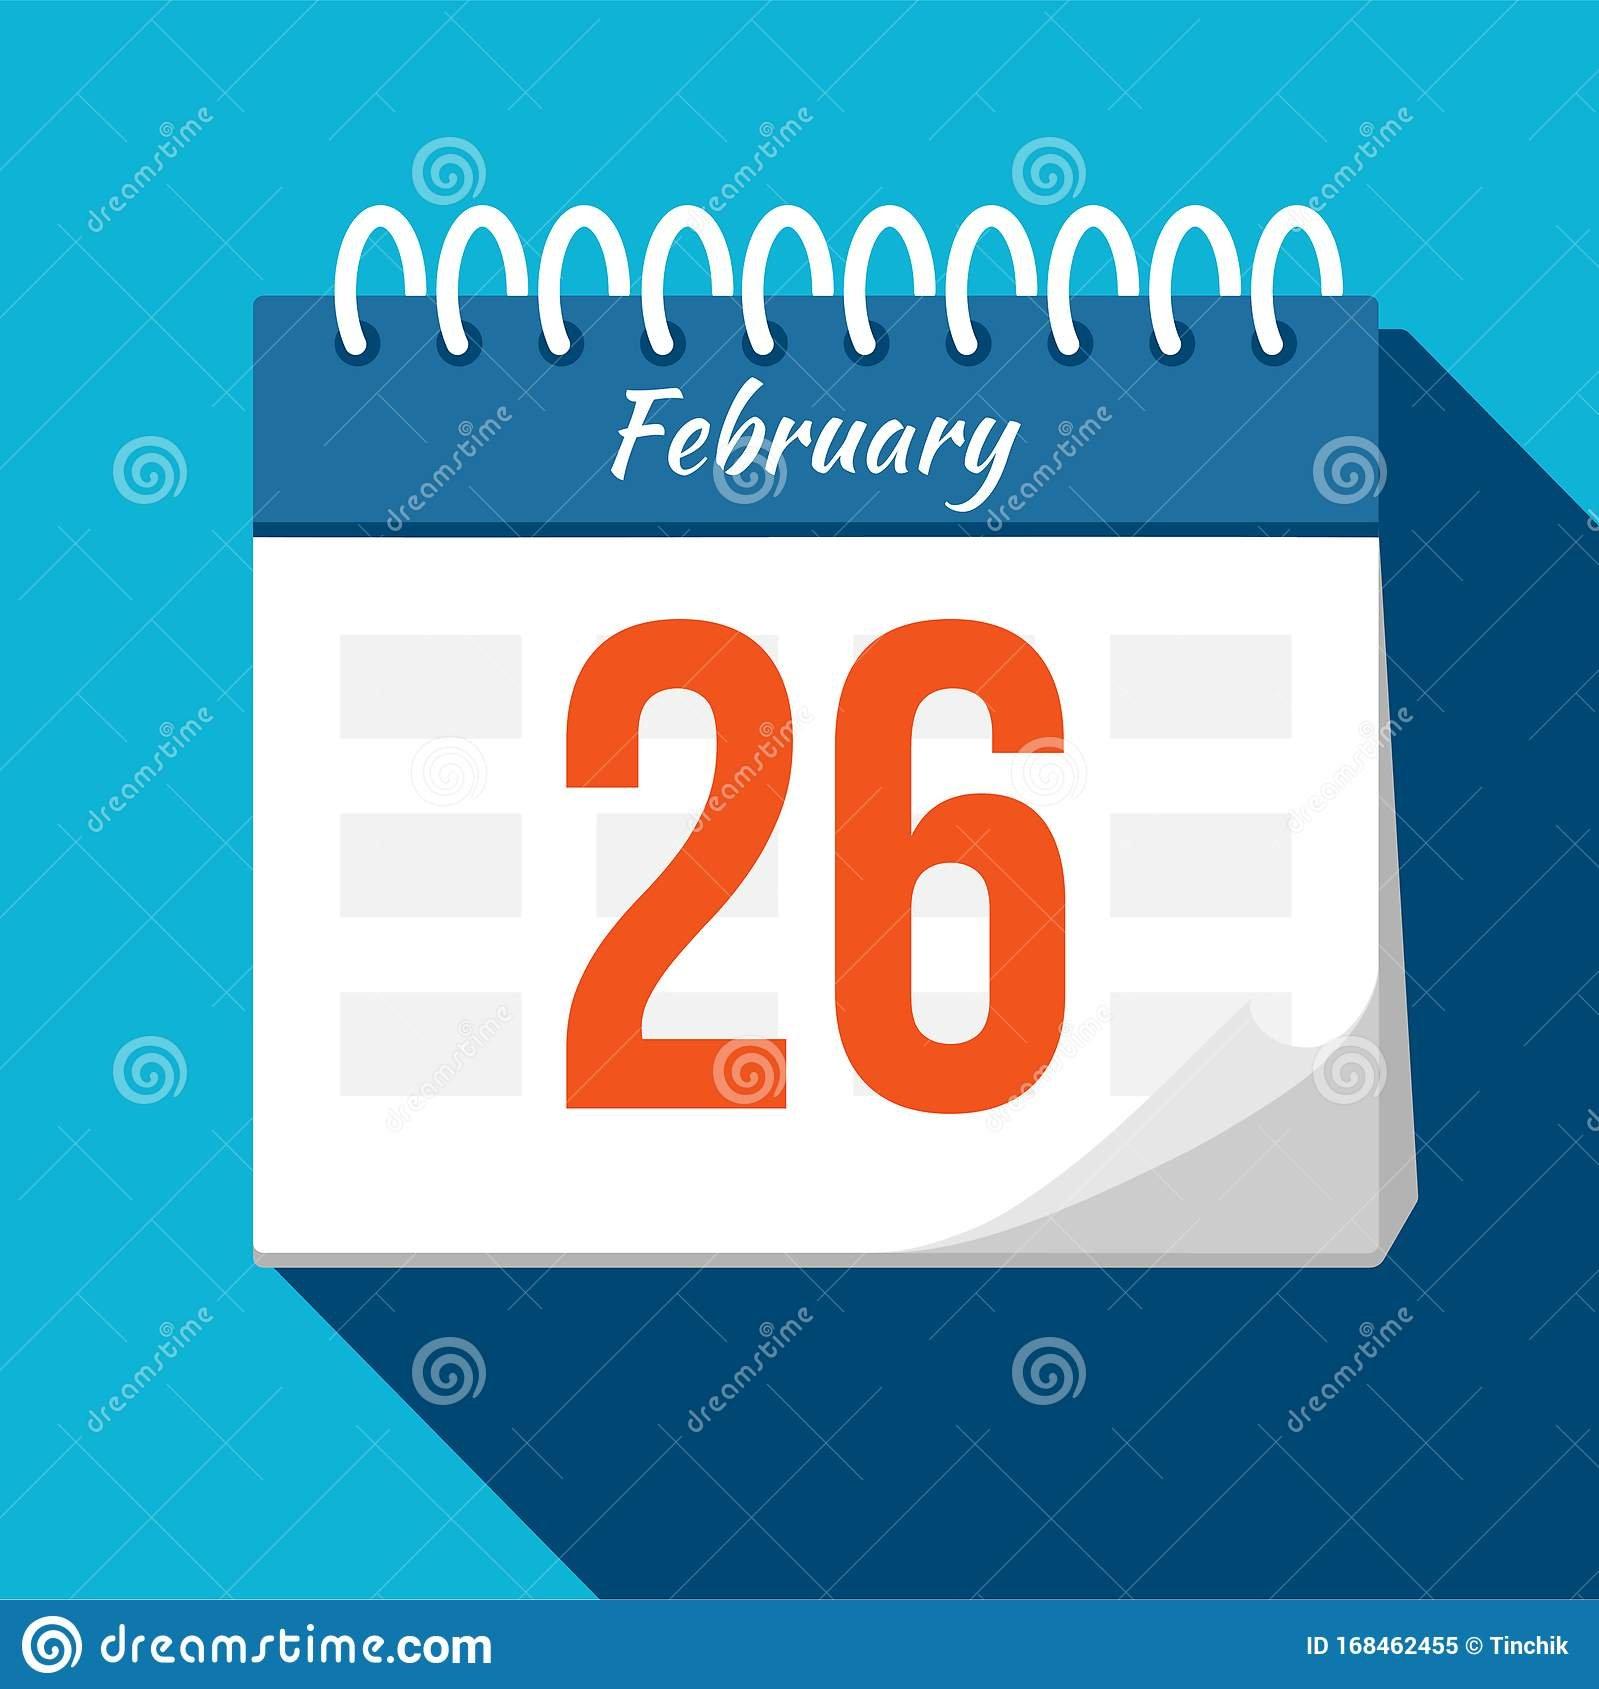 Calendar Icon. Calendar Date – February. Planning. Time Free Calendar For Time Management